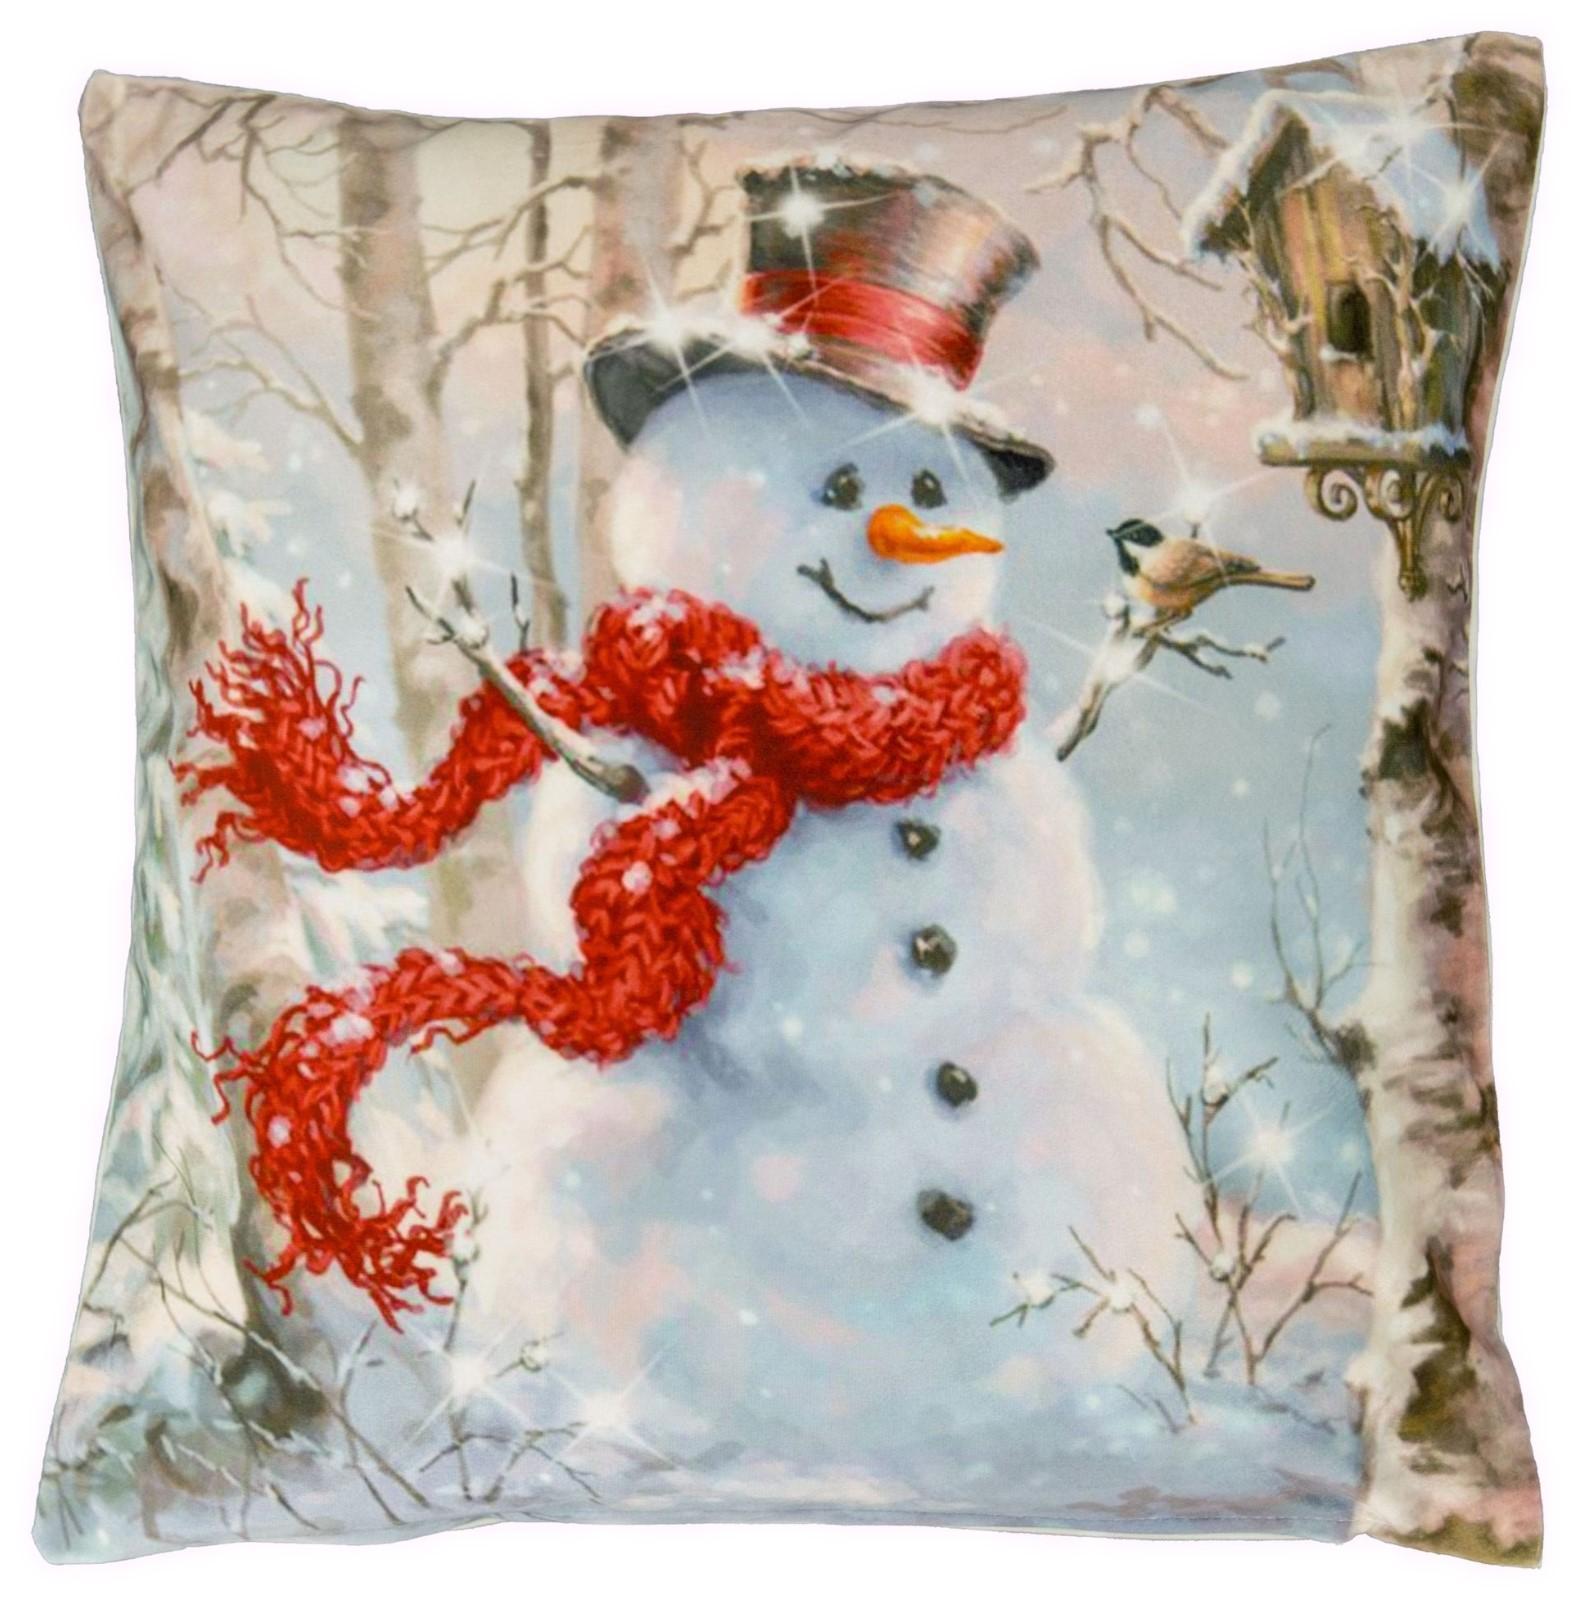 Kissenhülle Weihnachten Kissenbezug Dekokissen 40x40 Cm